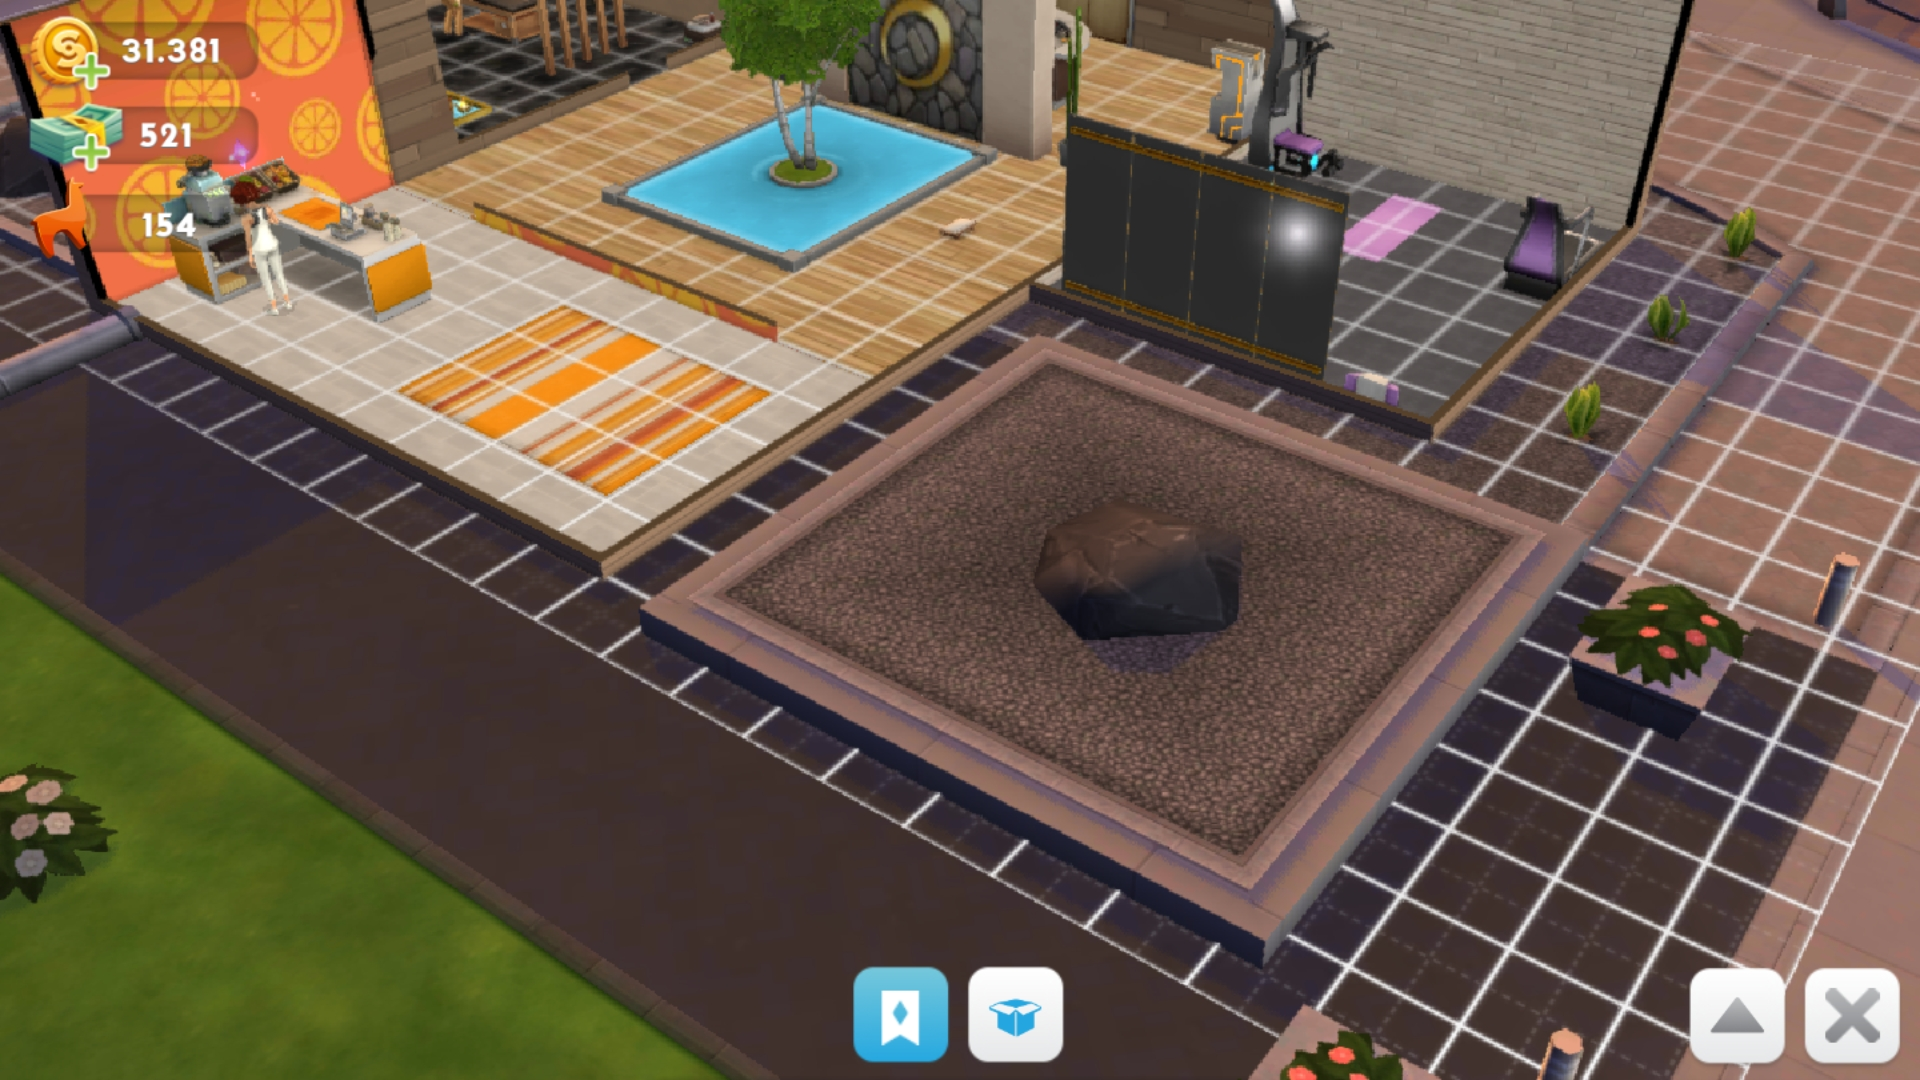 Screenshot_20180915-173948_The Sims.jpg